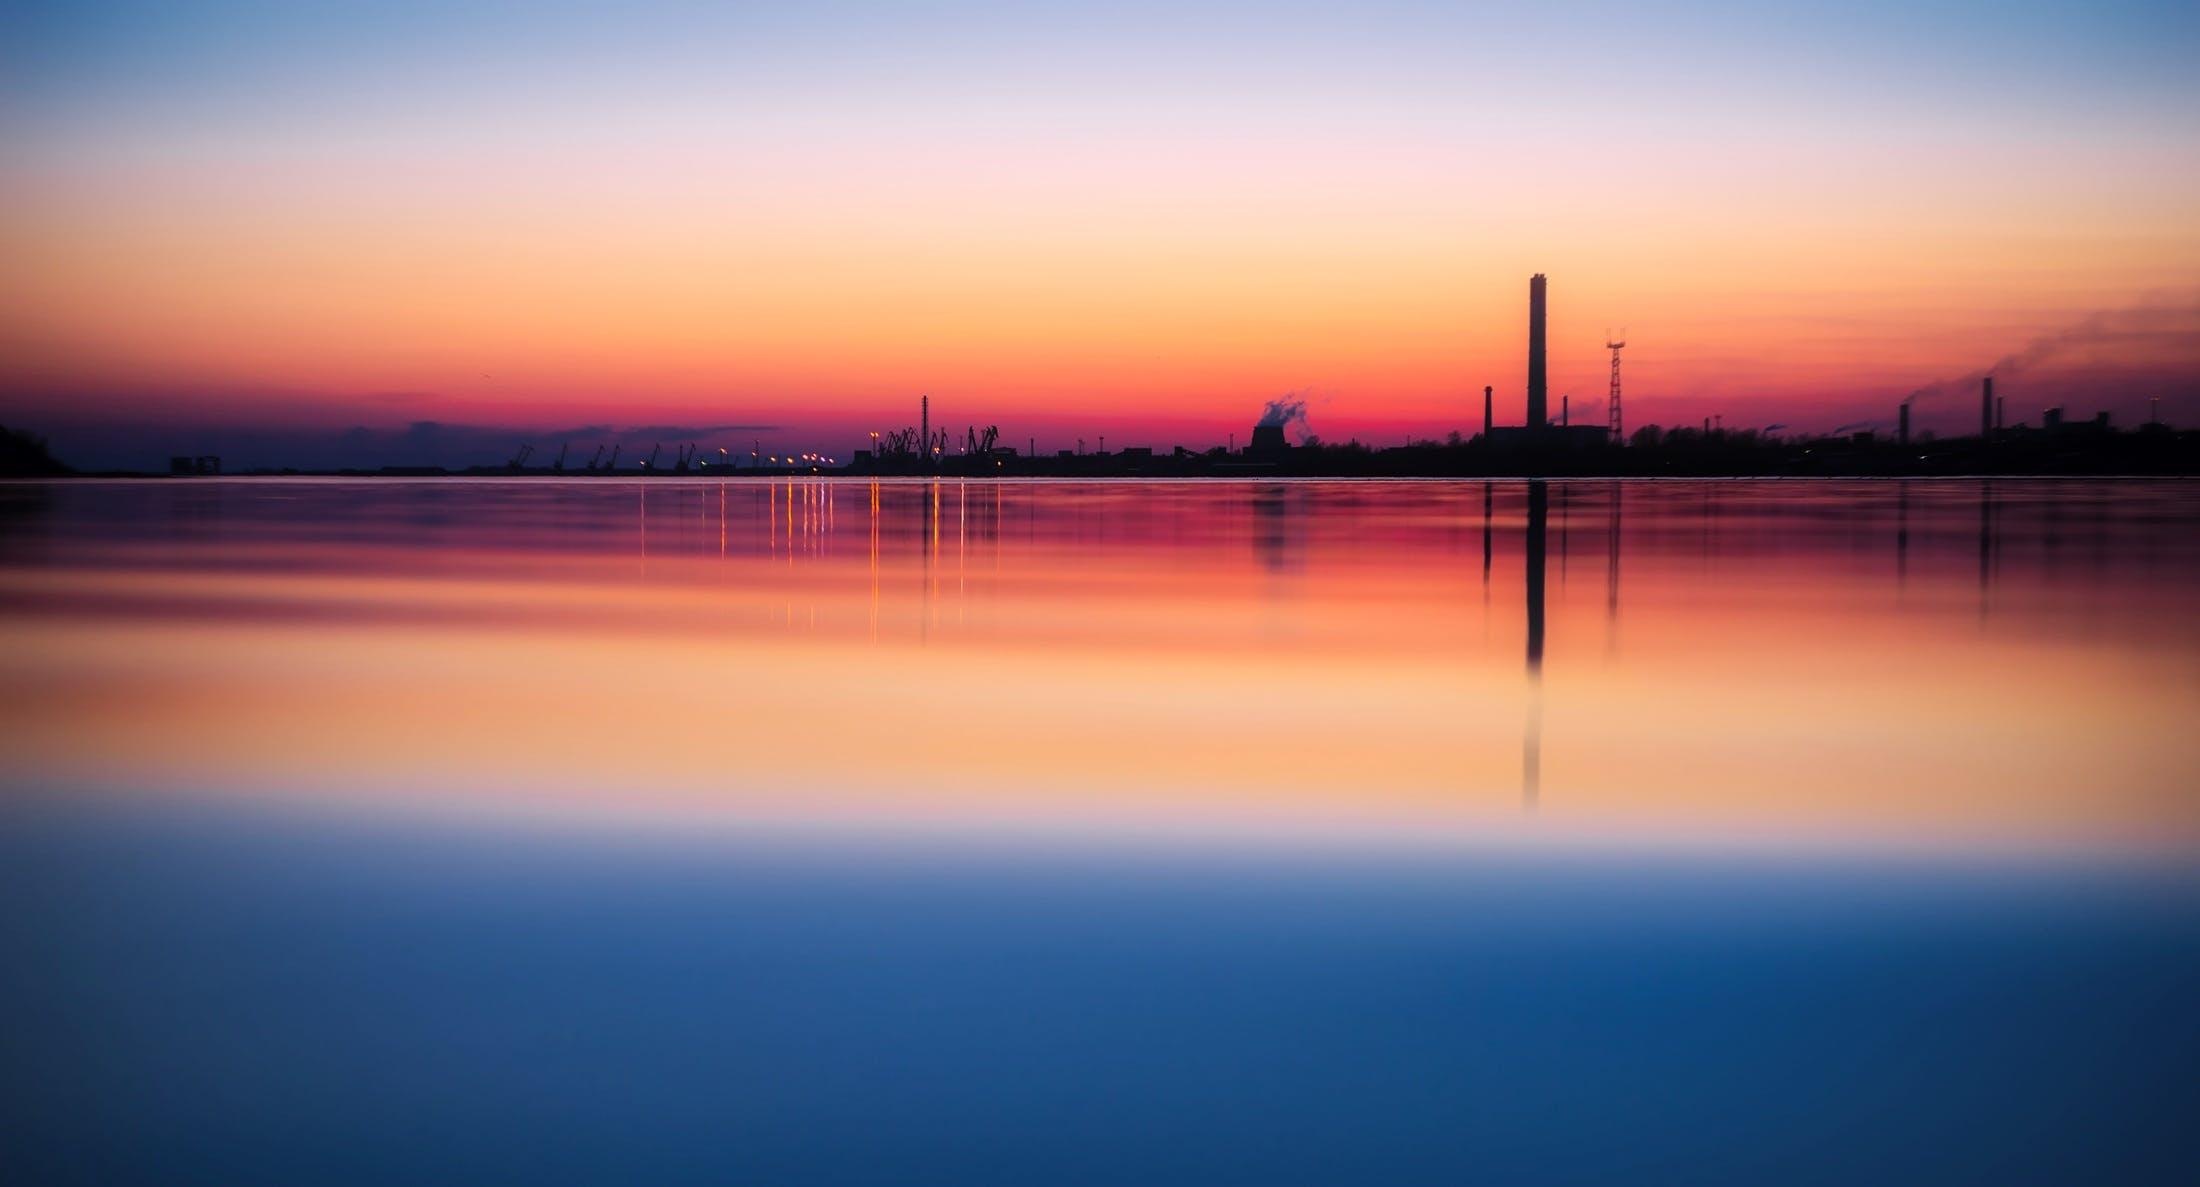 colors, dawn, dusk